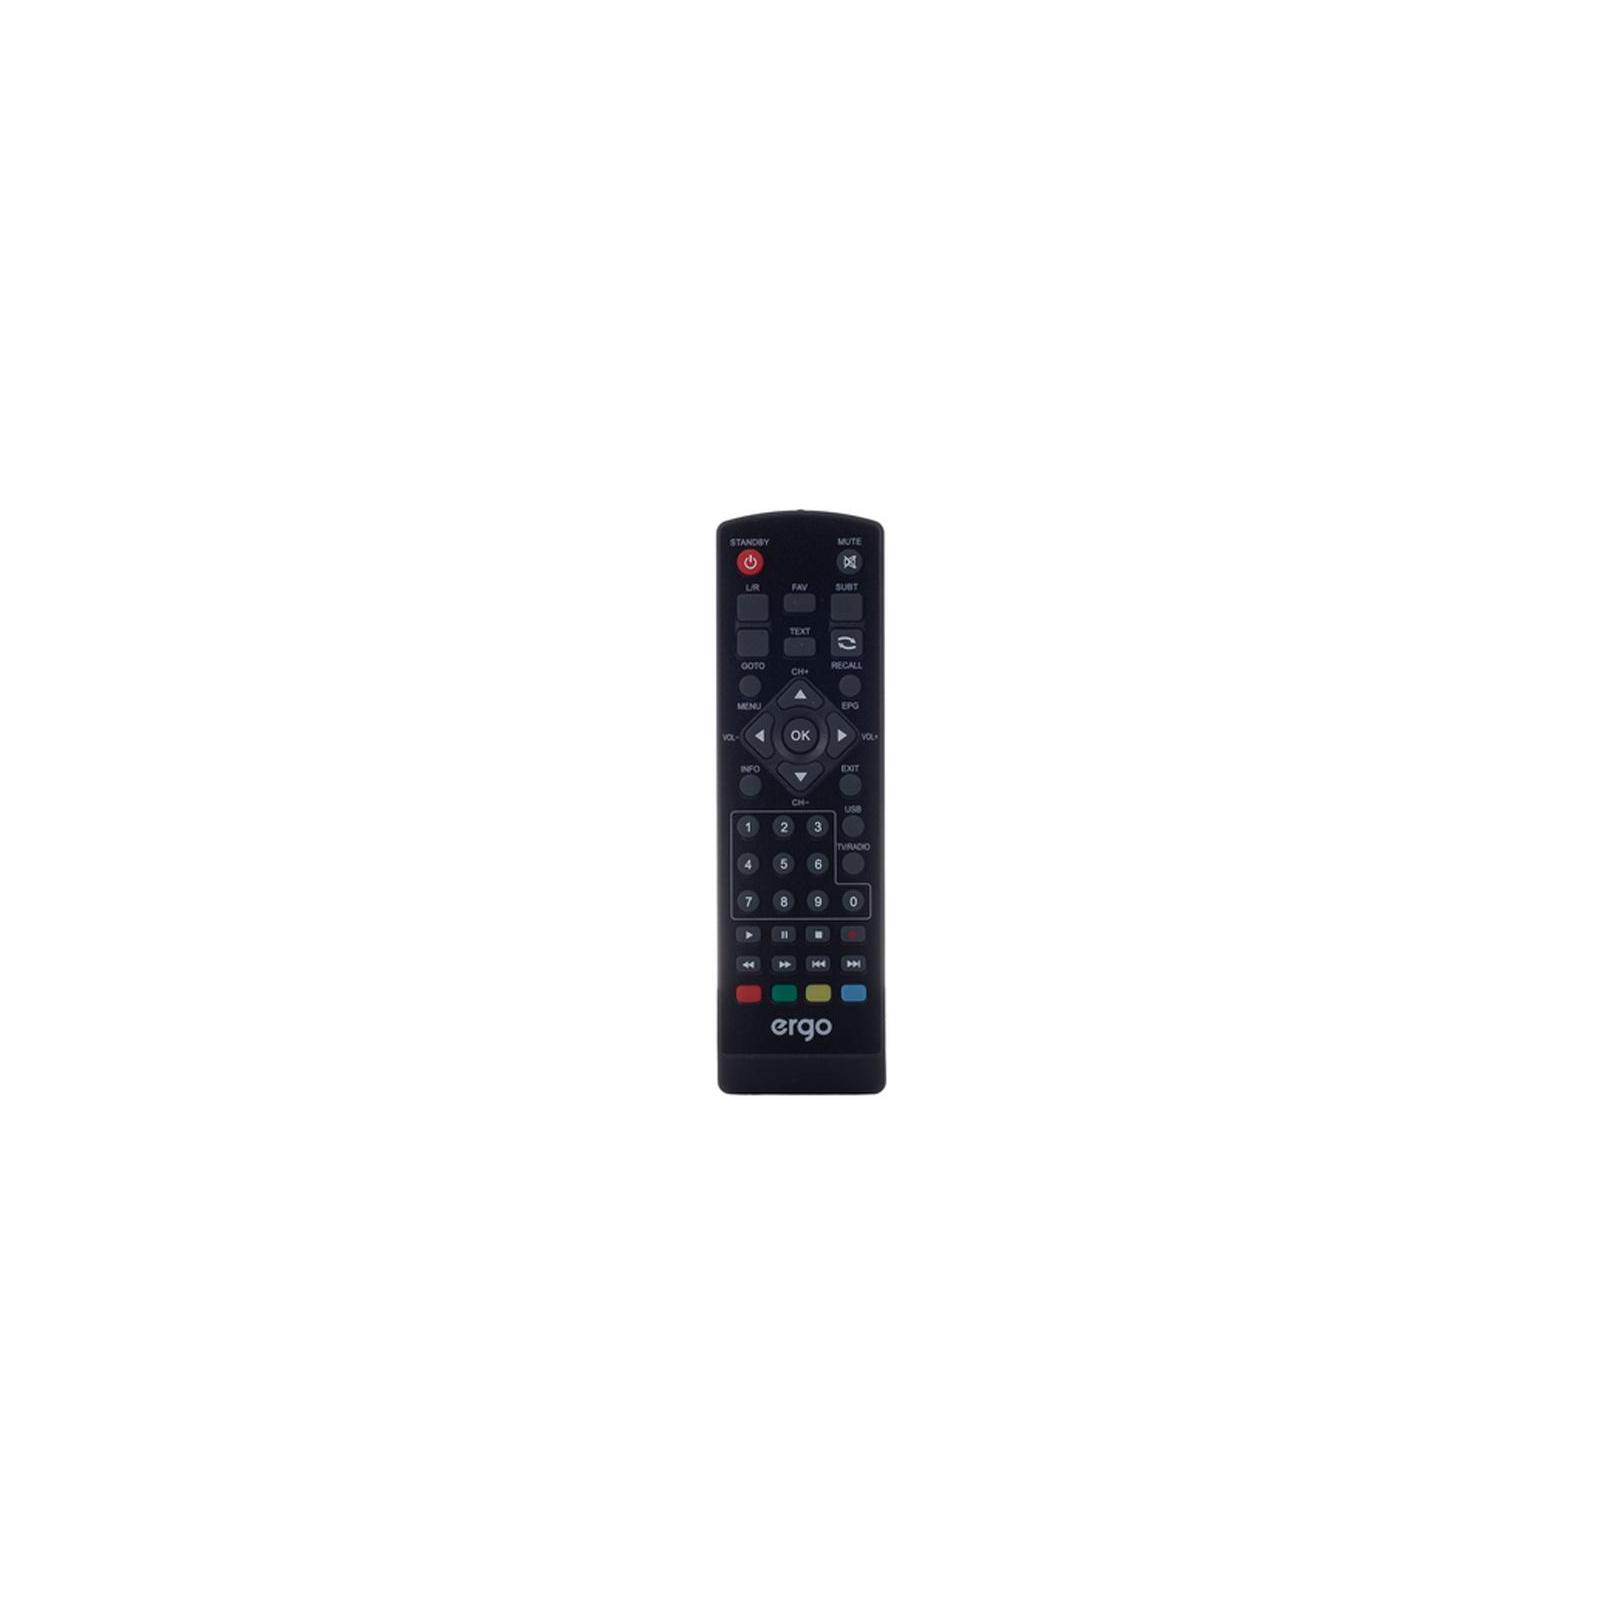 ТВ тюнер Ergo 1638 (DVB-T, DVB-T2) (STB-1638) зображення 7